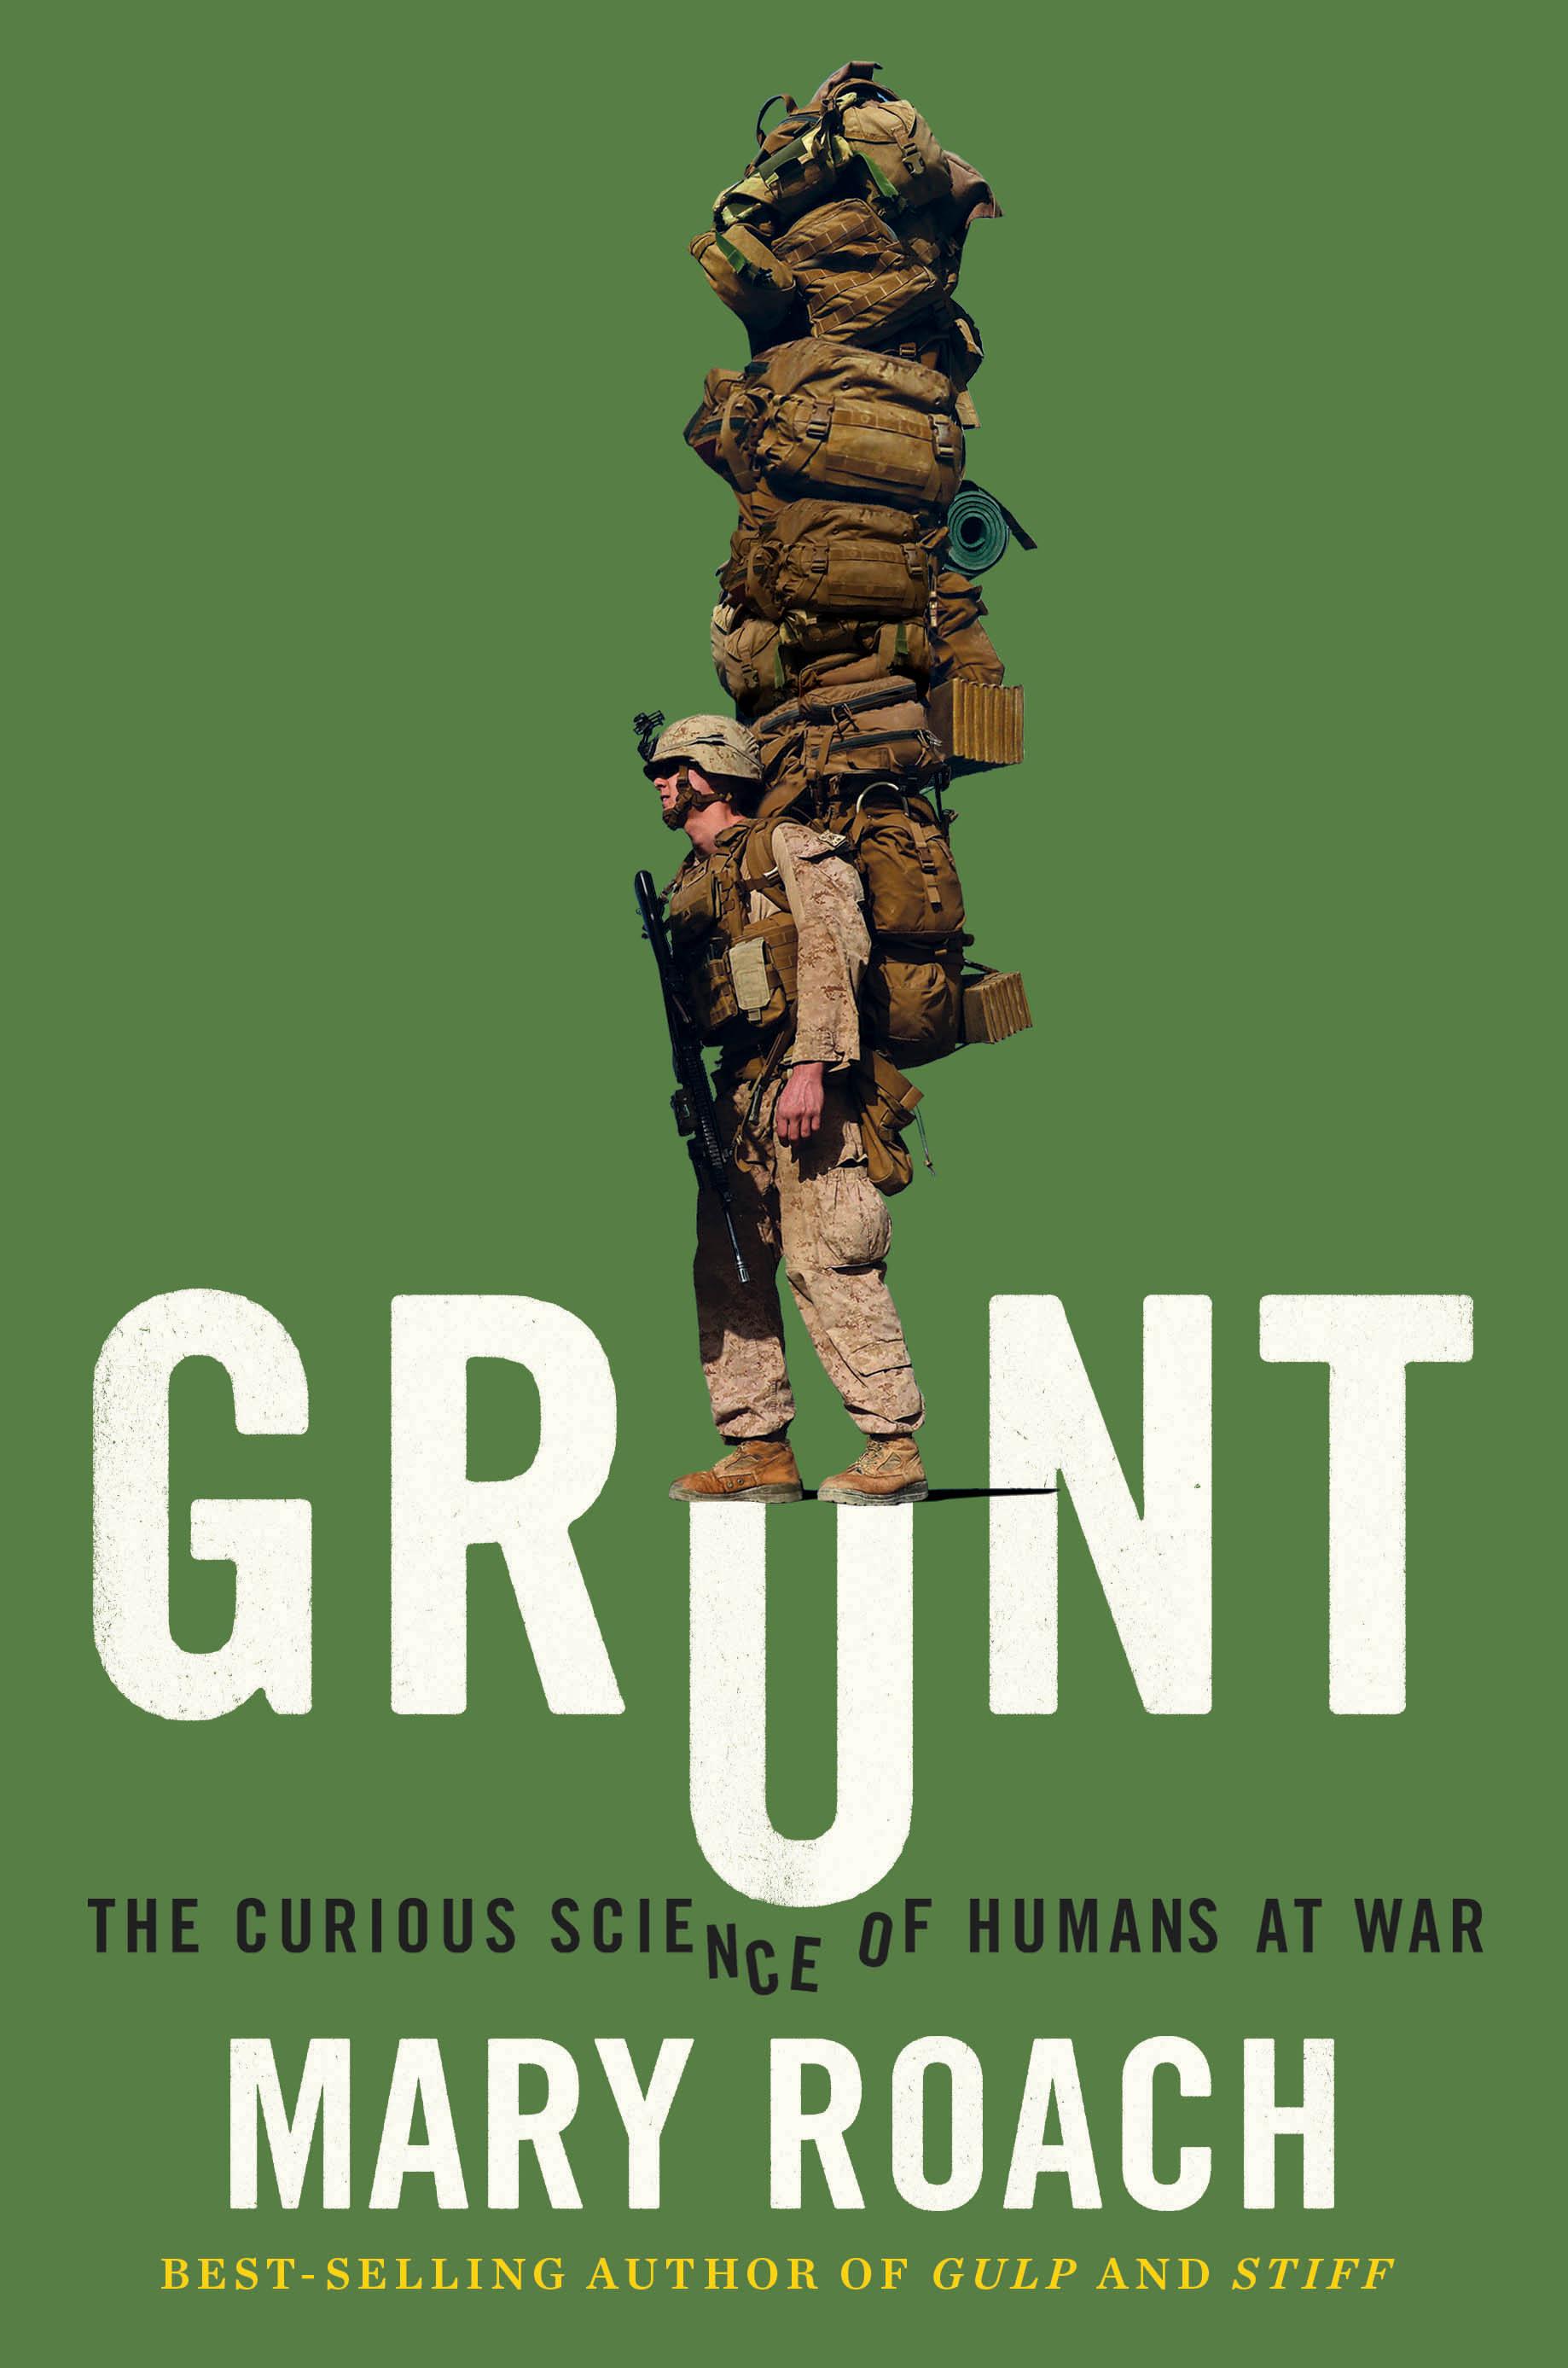 grunt-978-0-393-24544-8